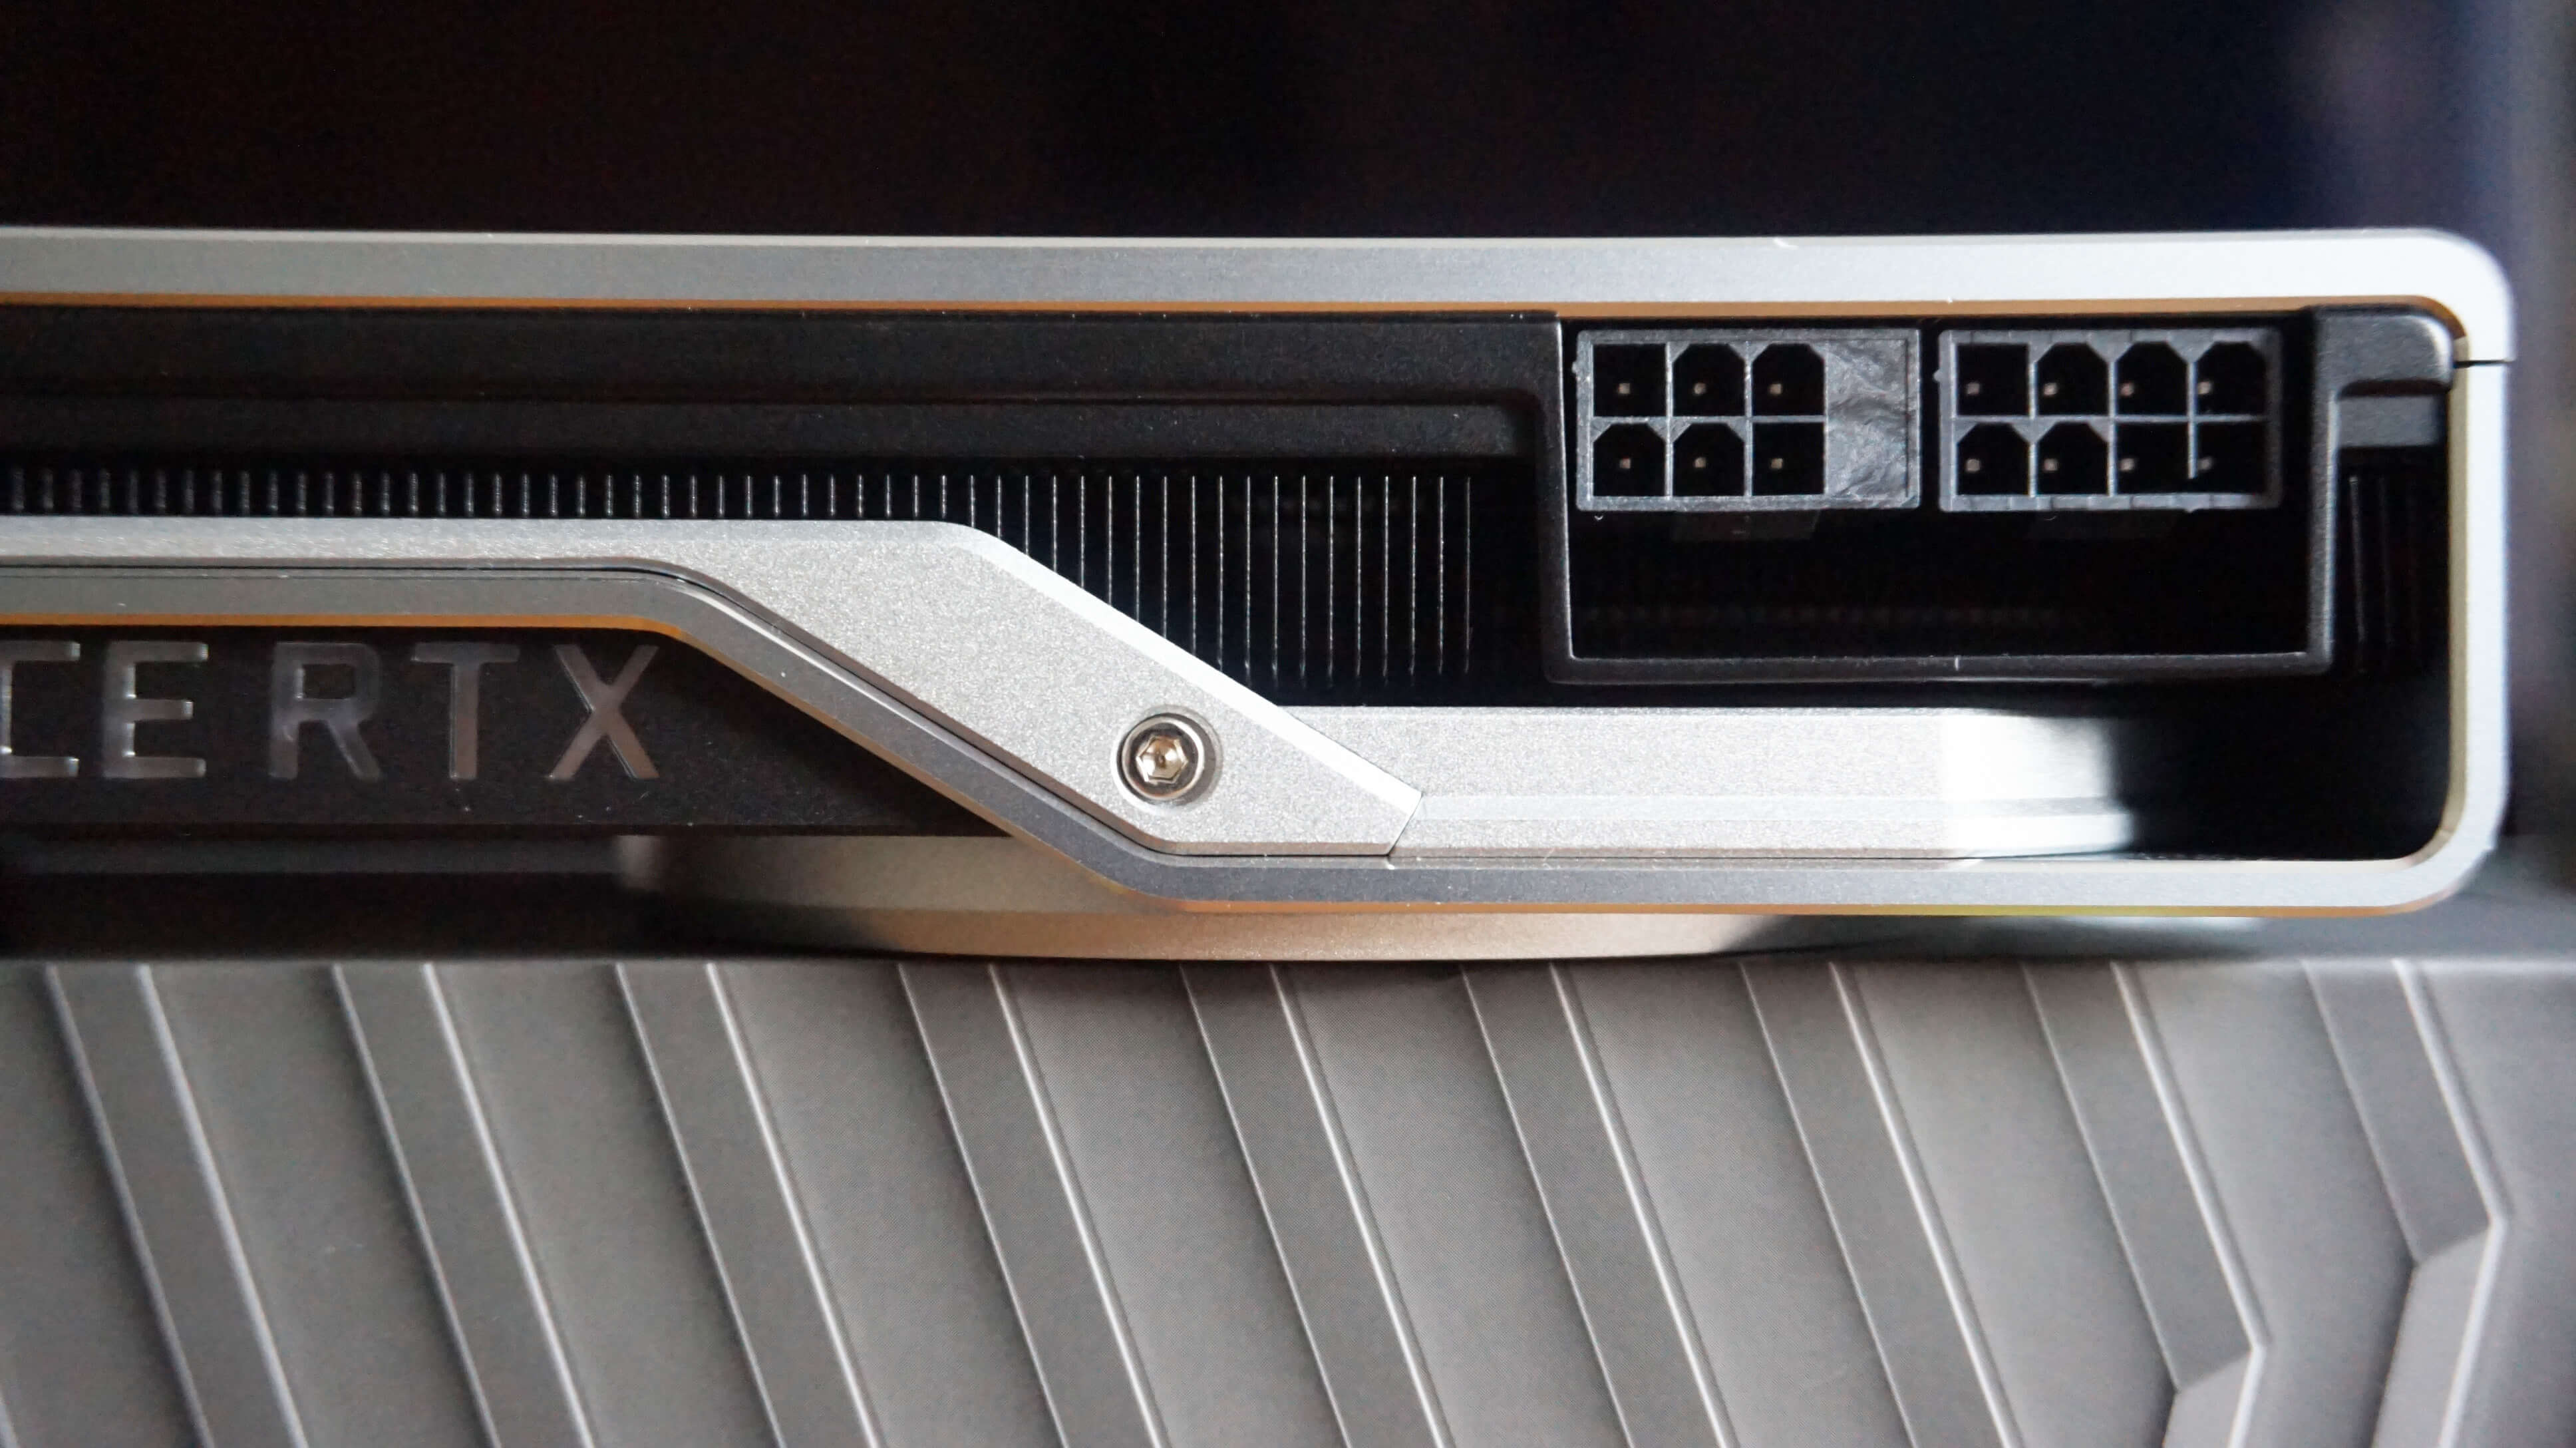 RTX 2080 GPU الالعاب